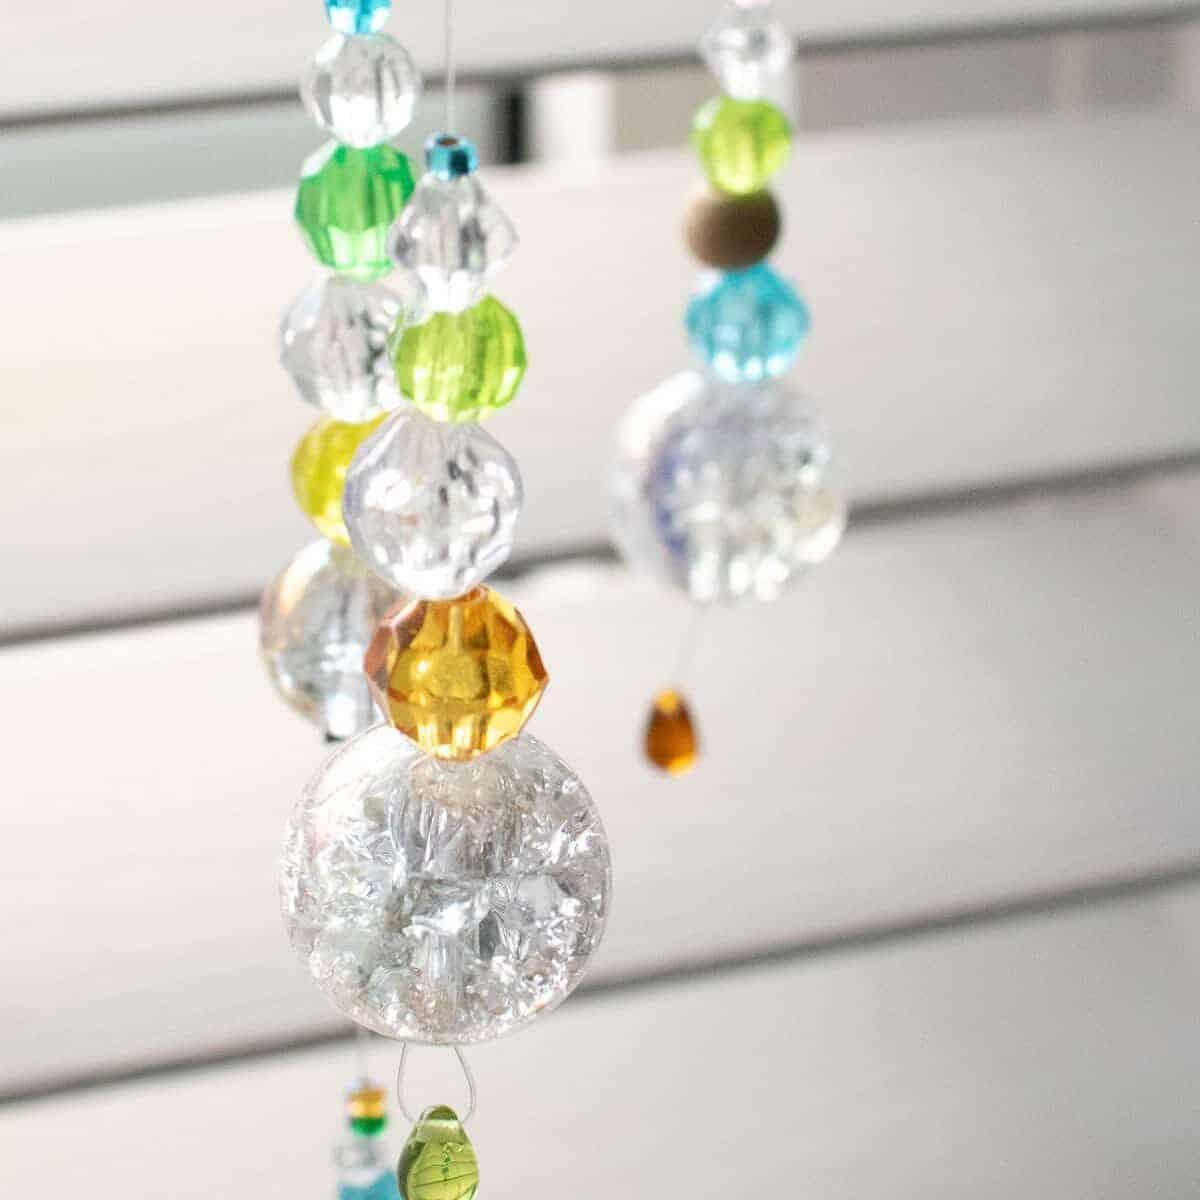 DIY Suncatcher with Beads shinning in sunlight